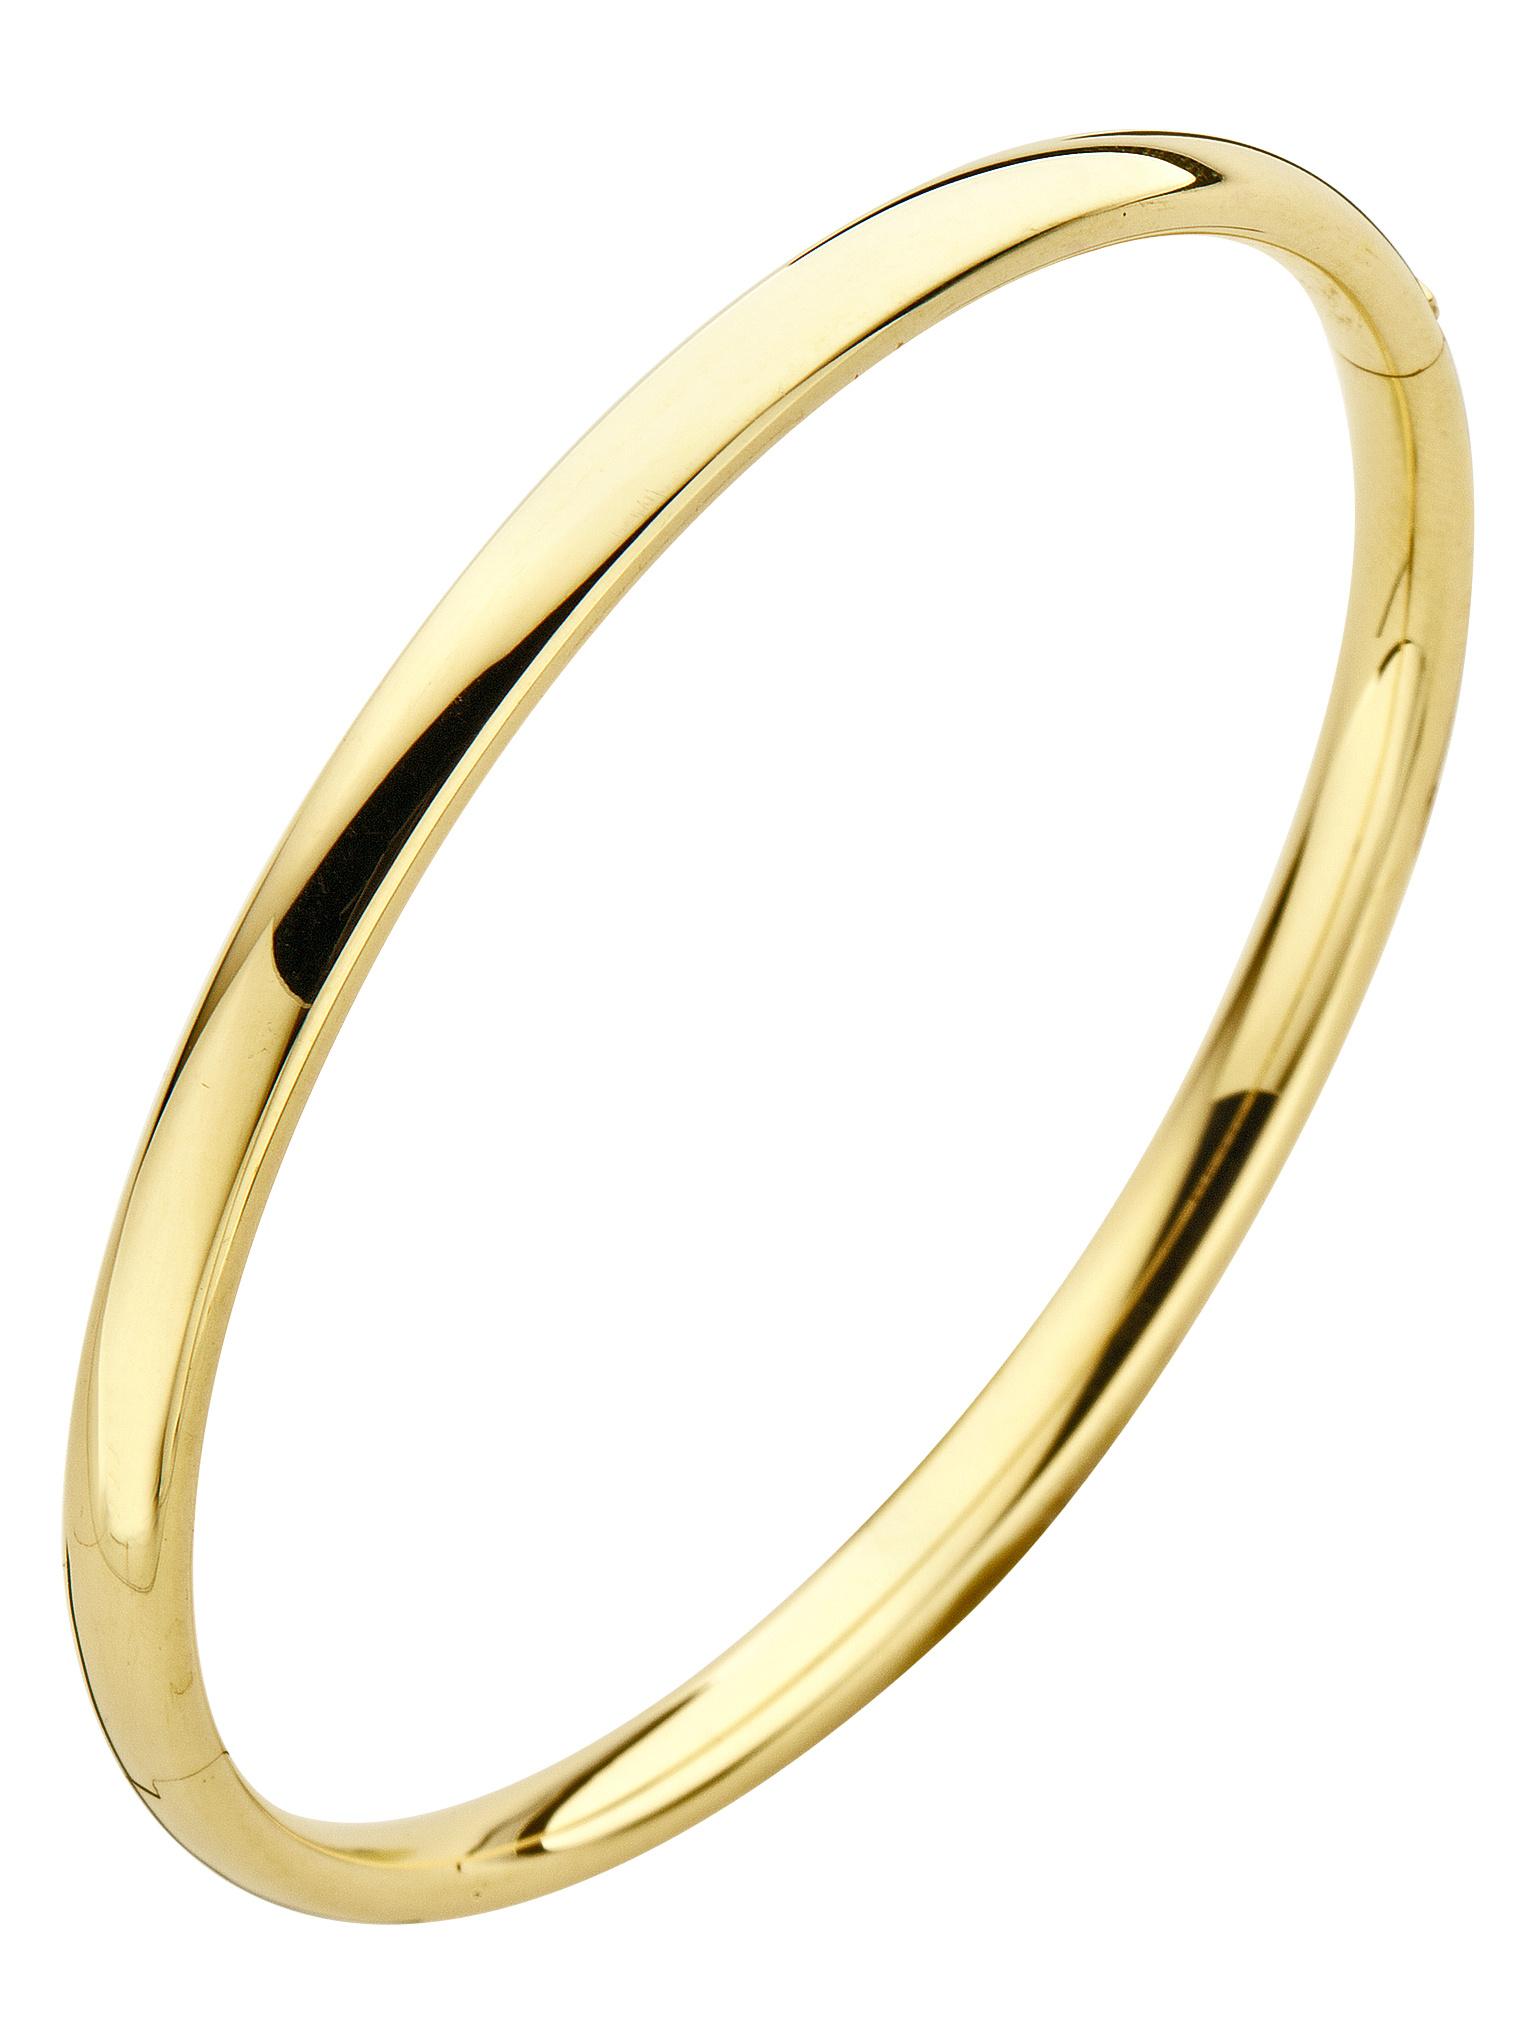 14 karaat geelgouden armband - Ovaal 4 mm - Fjory - Slavenarmband-1